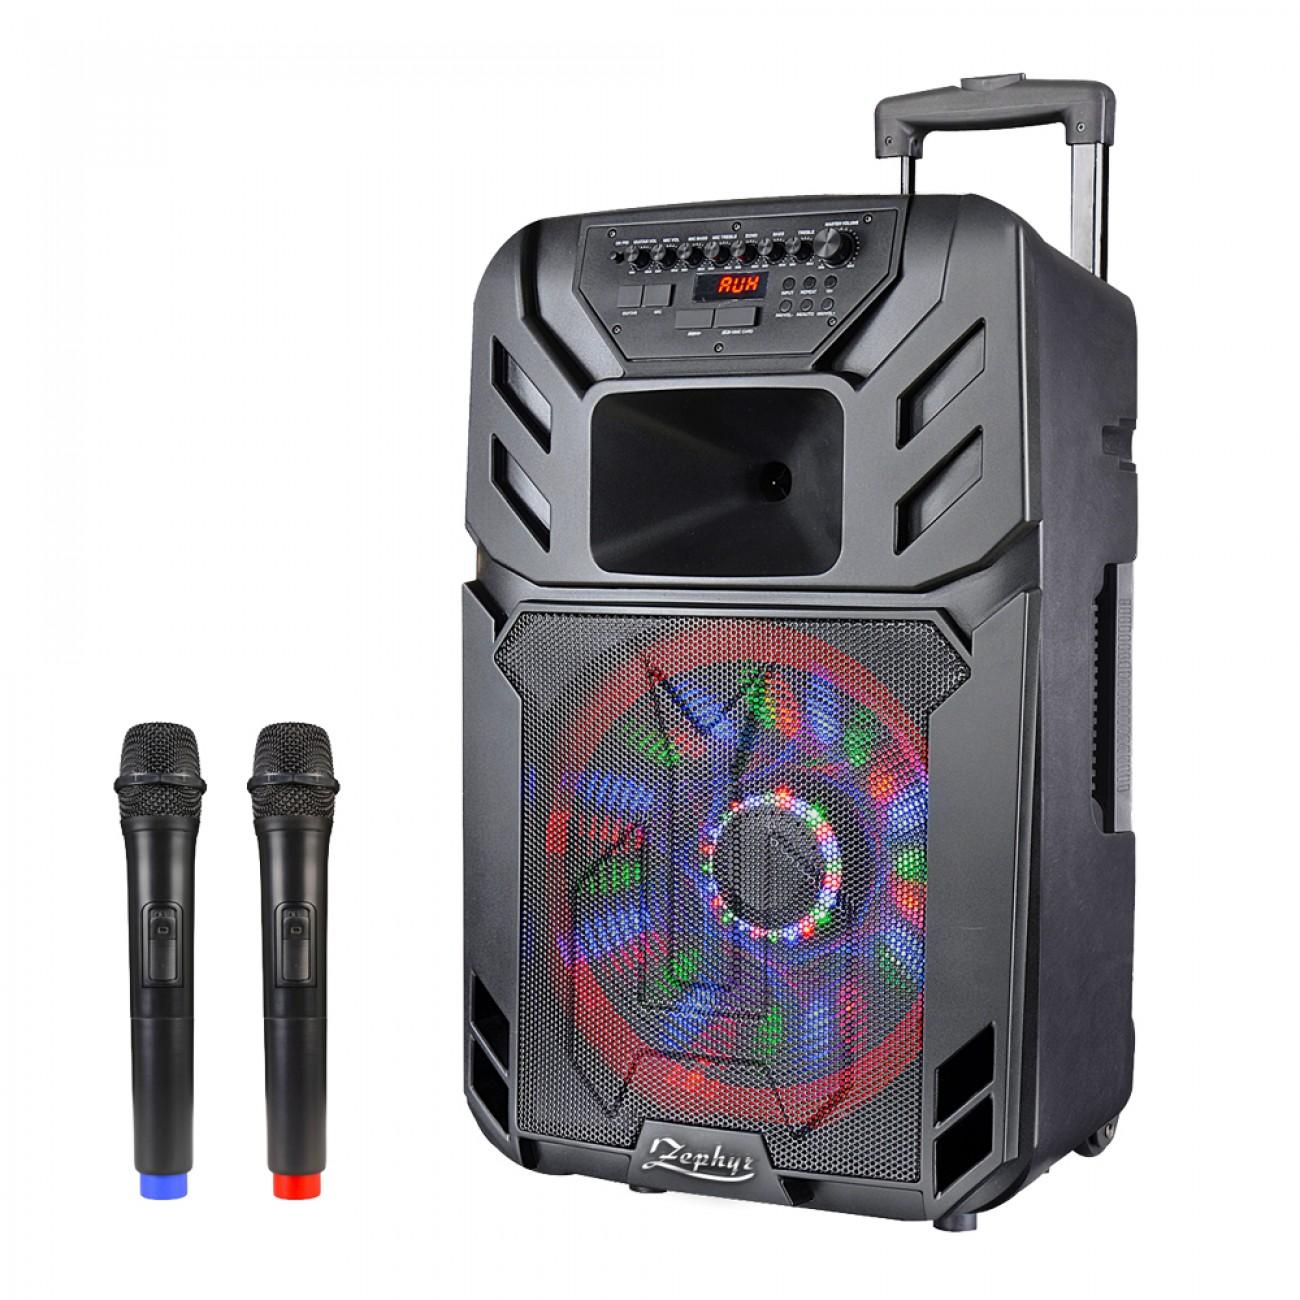 Преносима караоке система ZEPHYR ZP 9999 A15, 15 инча, Вграден акумулатор, Bluetooth, 2 бр. безжични микрофона в Преносими караоке тонколони - ZEPHYR | Alleop